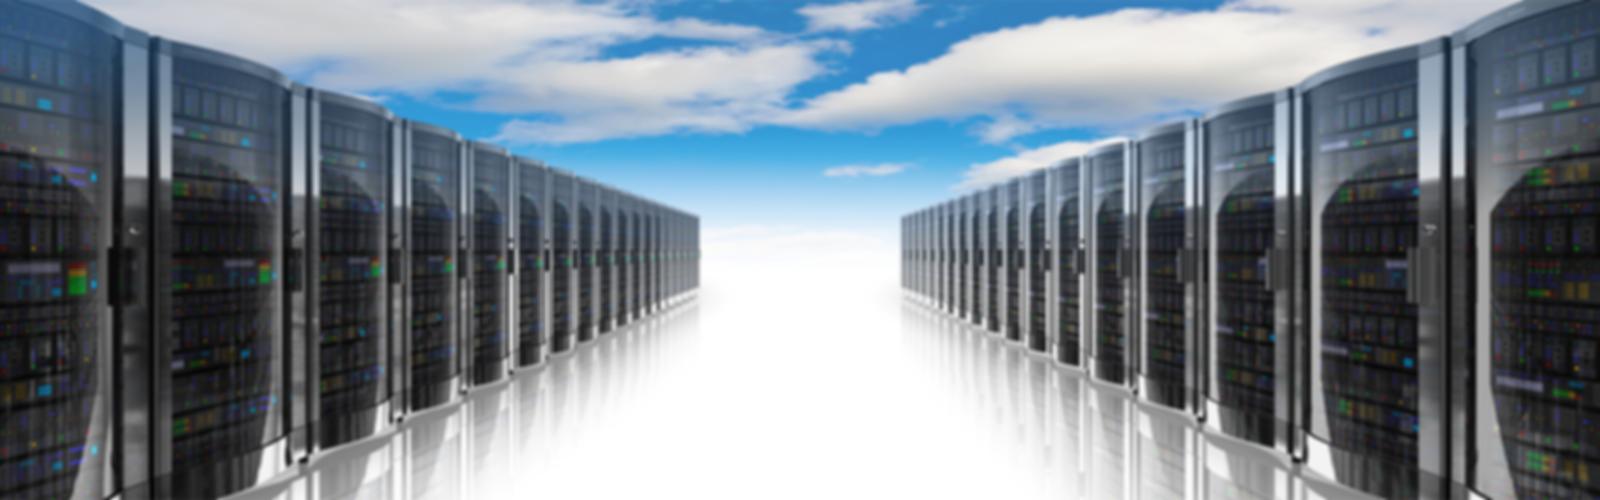 cloud-data_edited.png